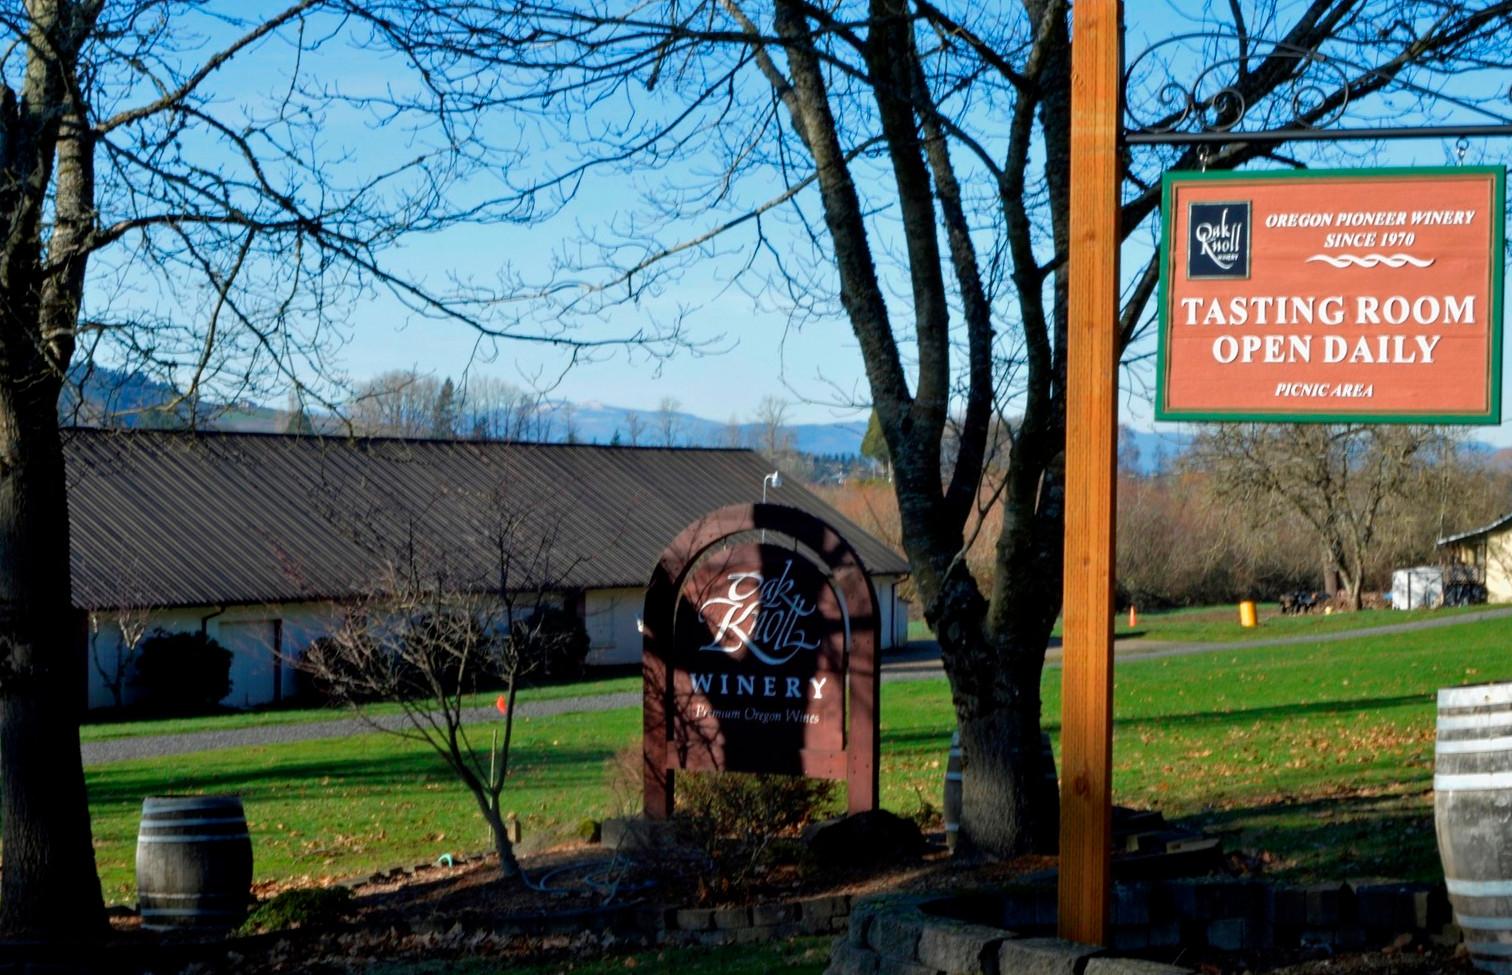 37-oak-knoll-tasting-room-hillsboro-oregon-the-kelly-group-real-estate